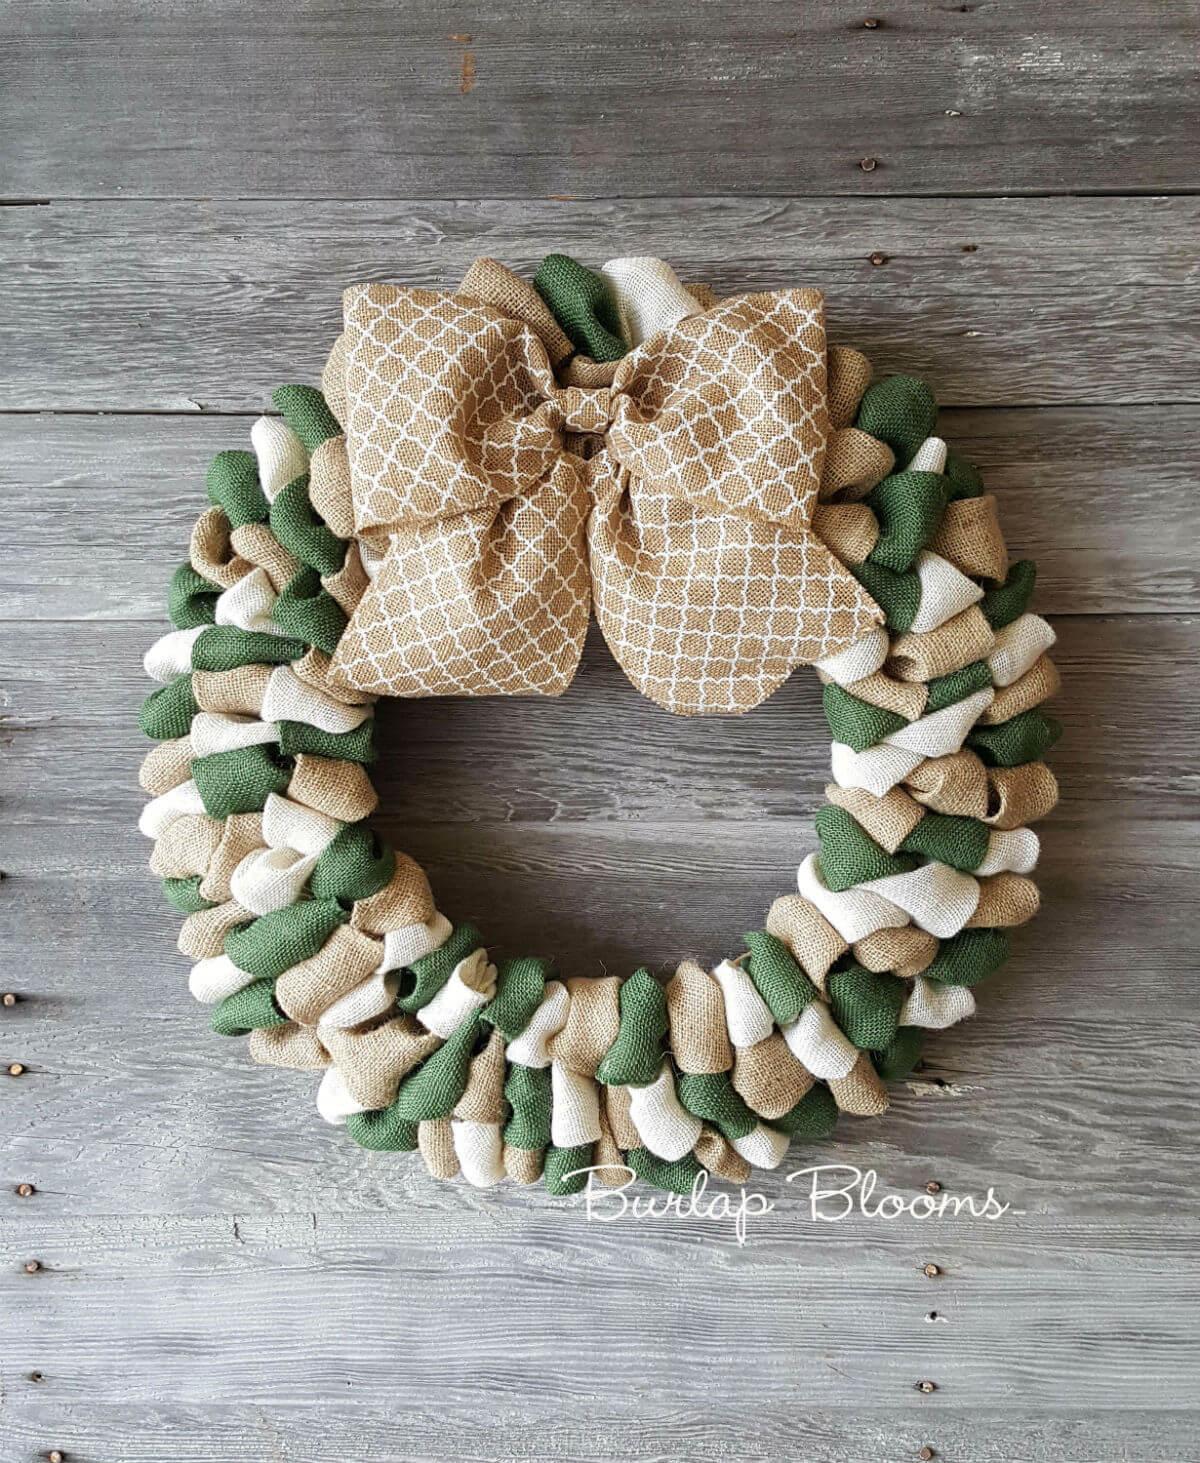 Cute Burlap Wreath with a Big Bow